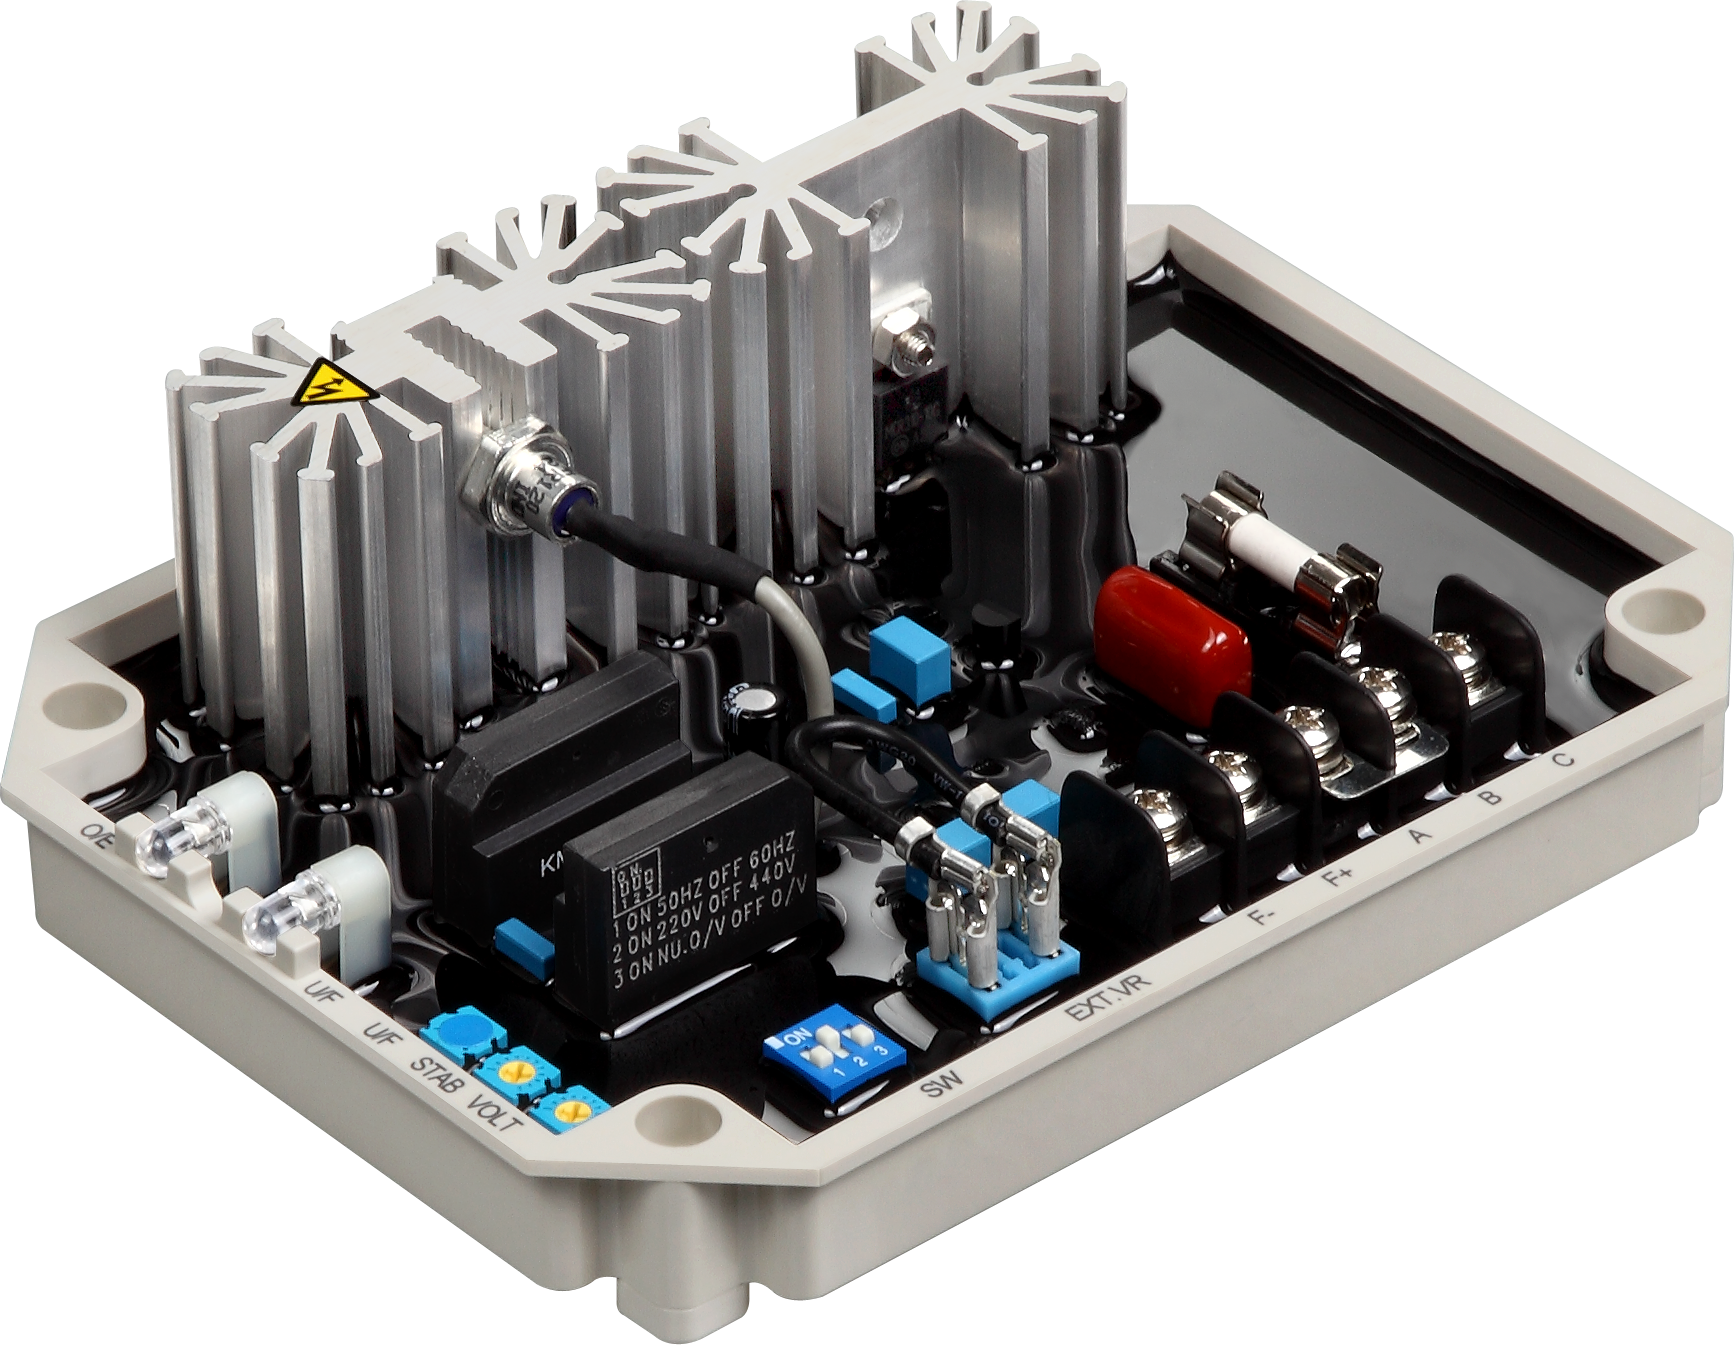 Vr21 Onan Voltage Regulator Wiring Diagram    Wiring Diagram